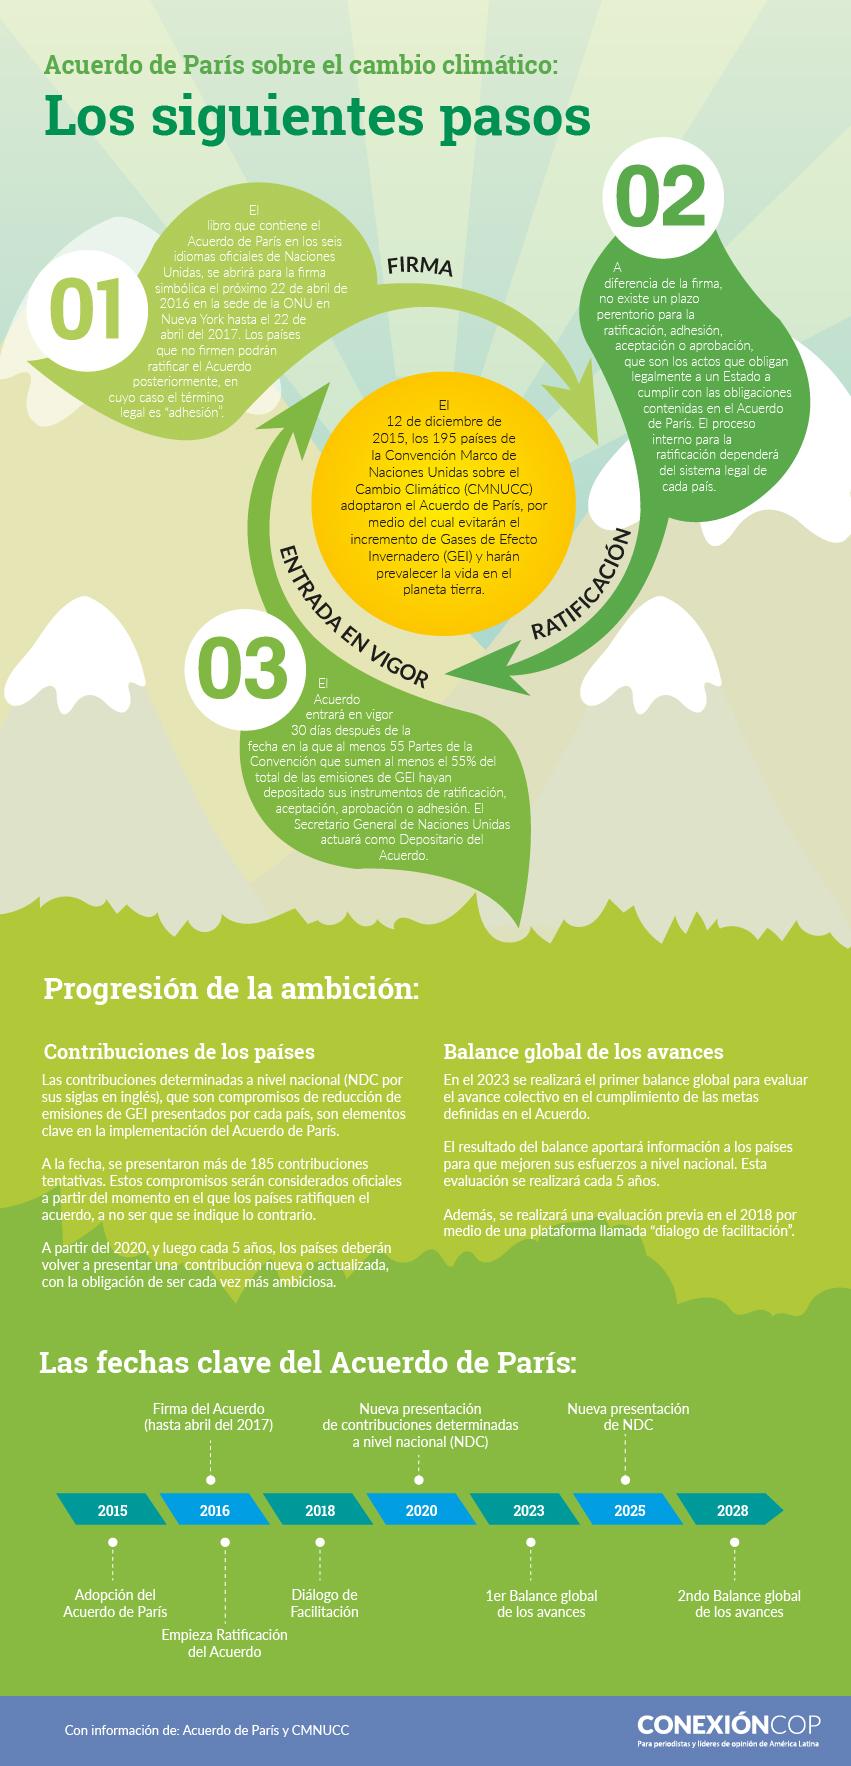 infografia_acuerdo_de_paris_cambio_climatico_COP21_pasos_implementacion_indc.jpg